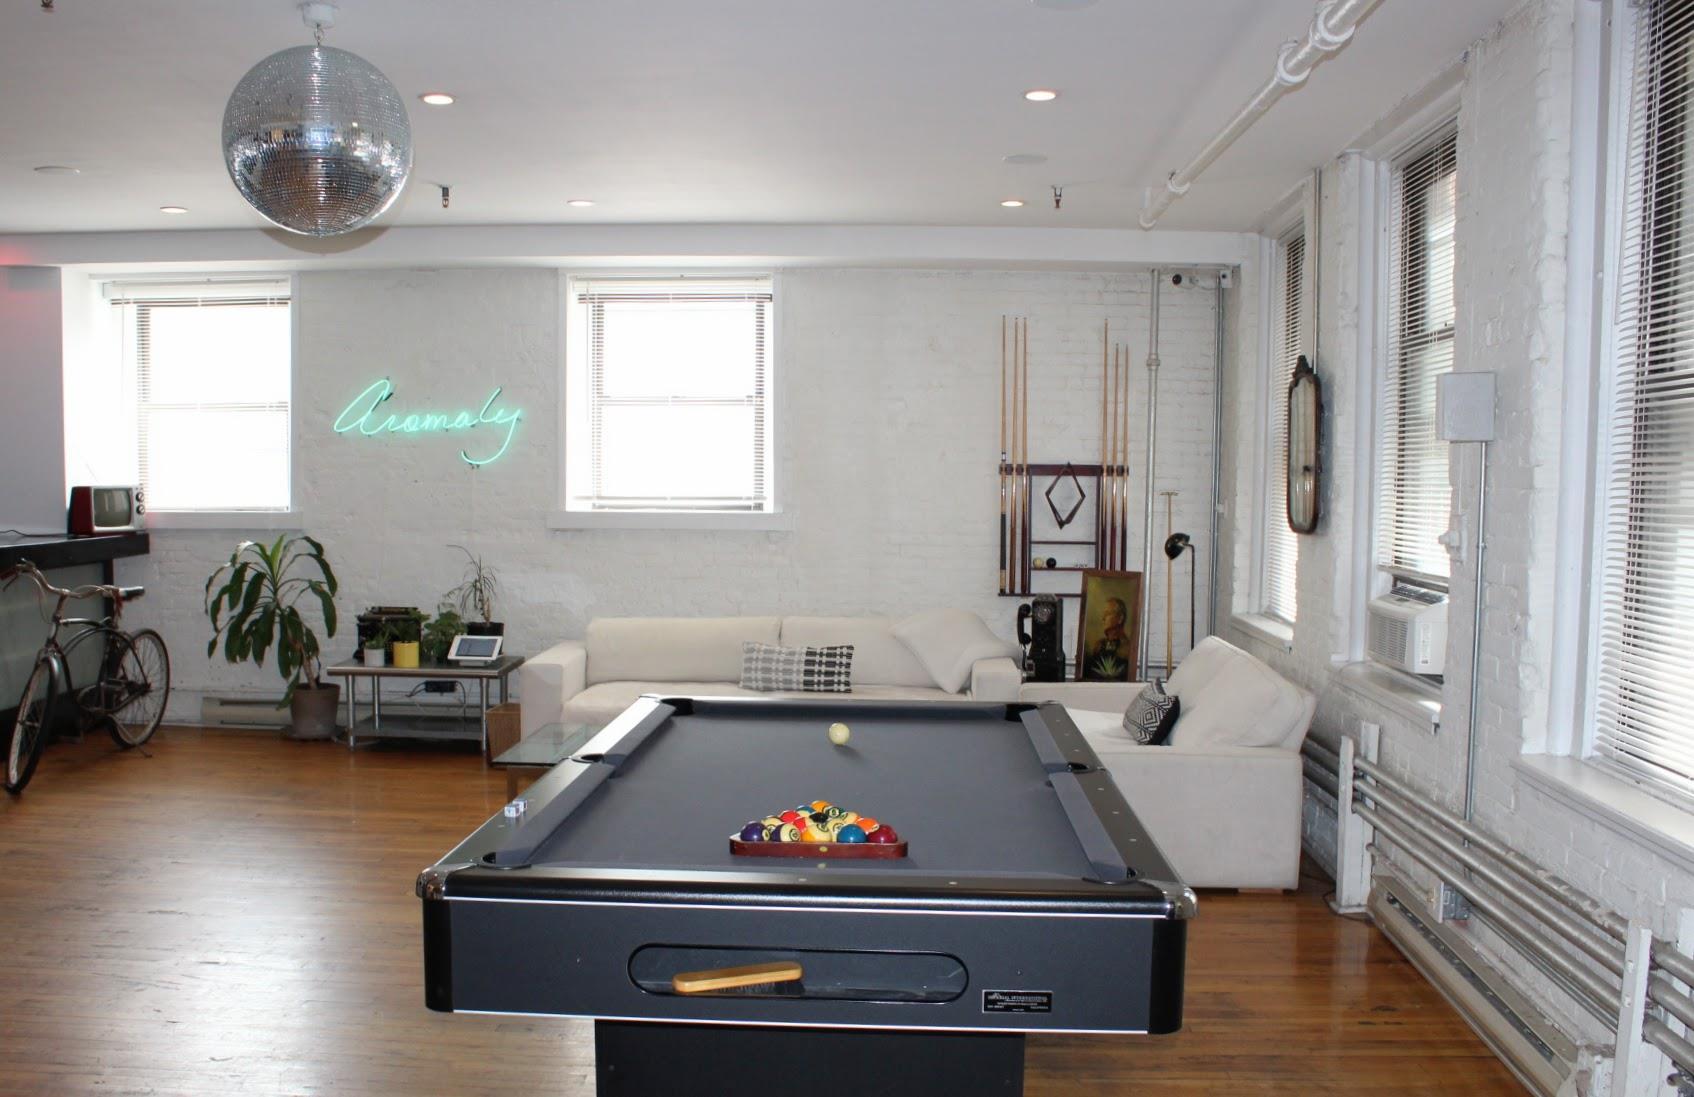 Cliqk Soho Meeting & Event Spaces - Soho Creative Boardroom & Lounge